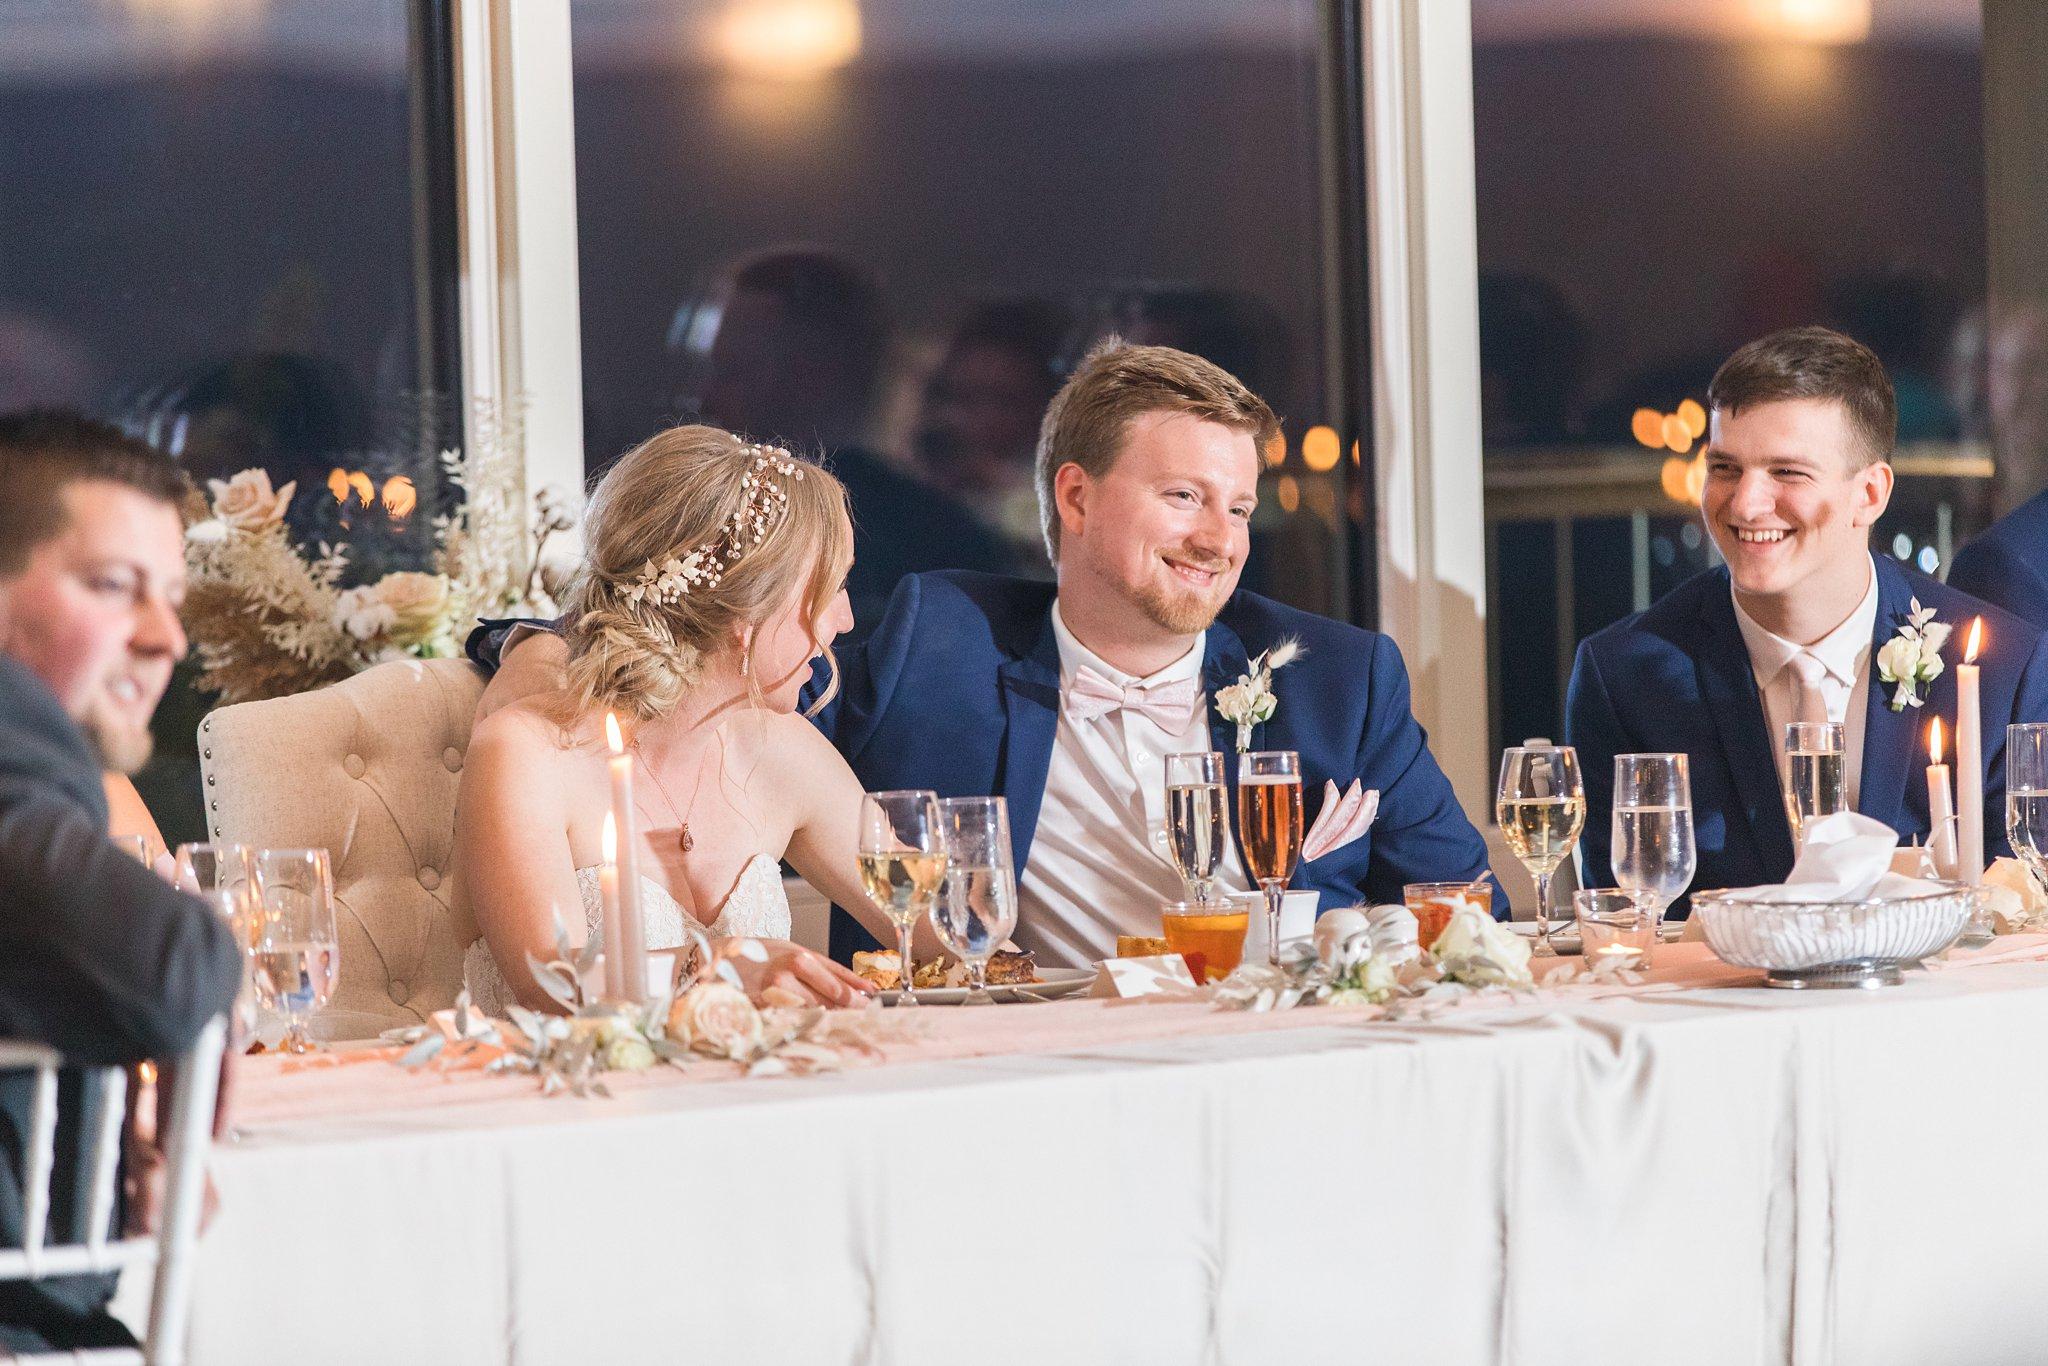 Speeches, Wakefield wedding photos, Le Belvedere